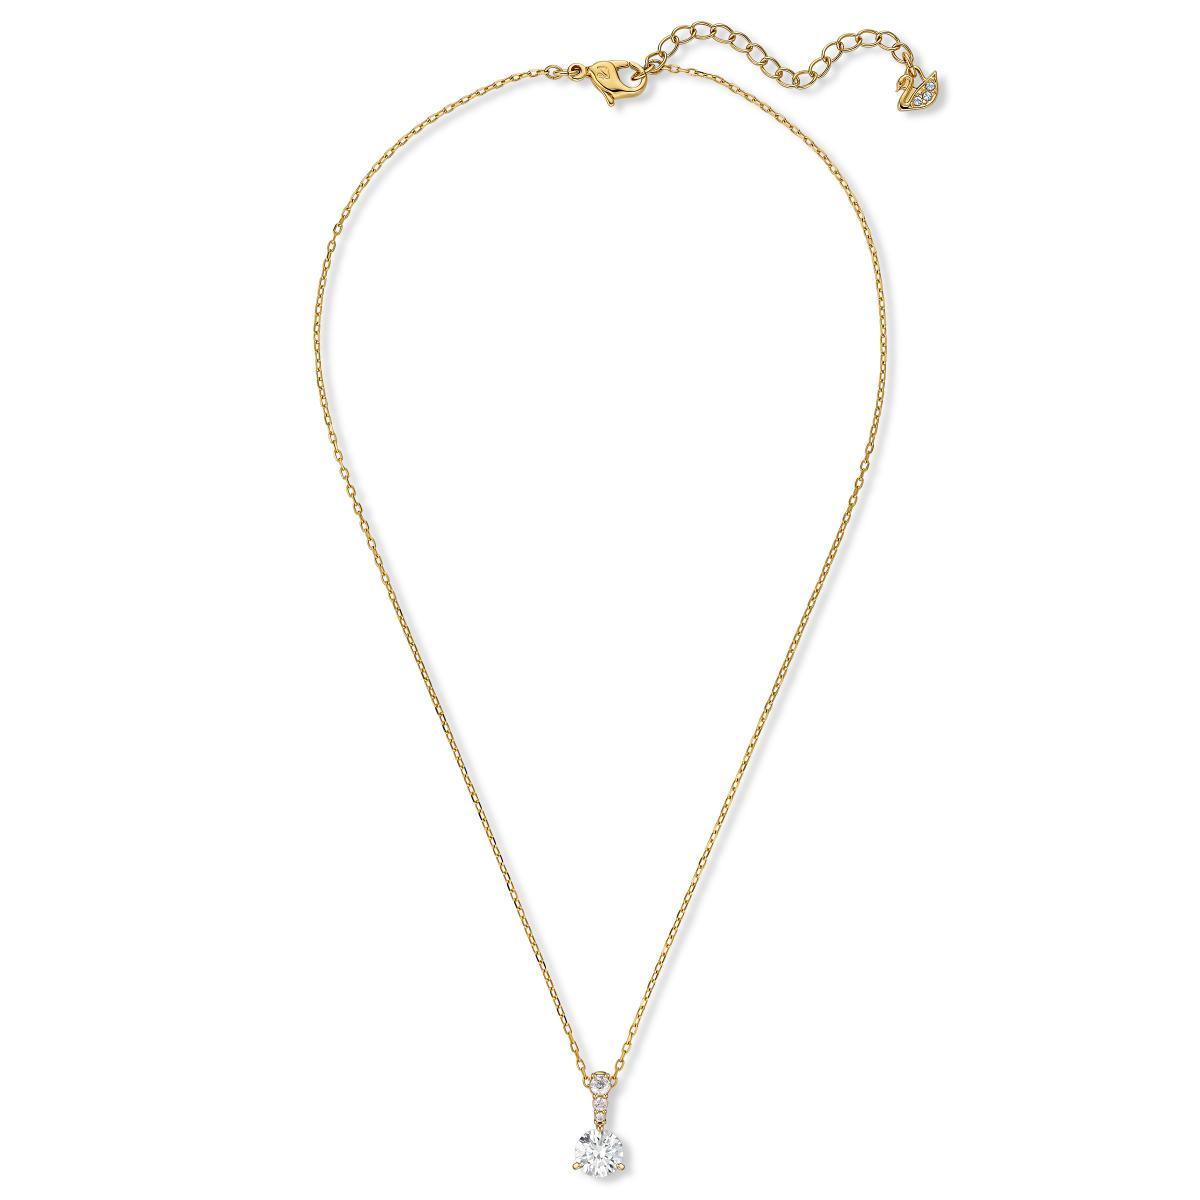 Collier Swarovski 5511557 - Collier métal rhodié or cristal blanc Femme